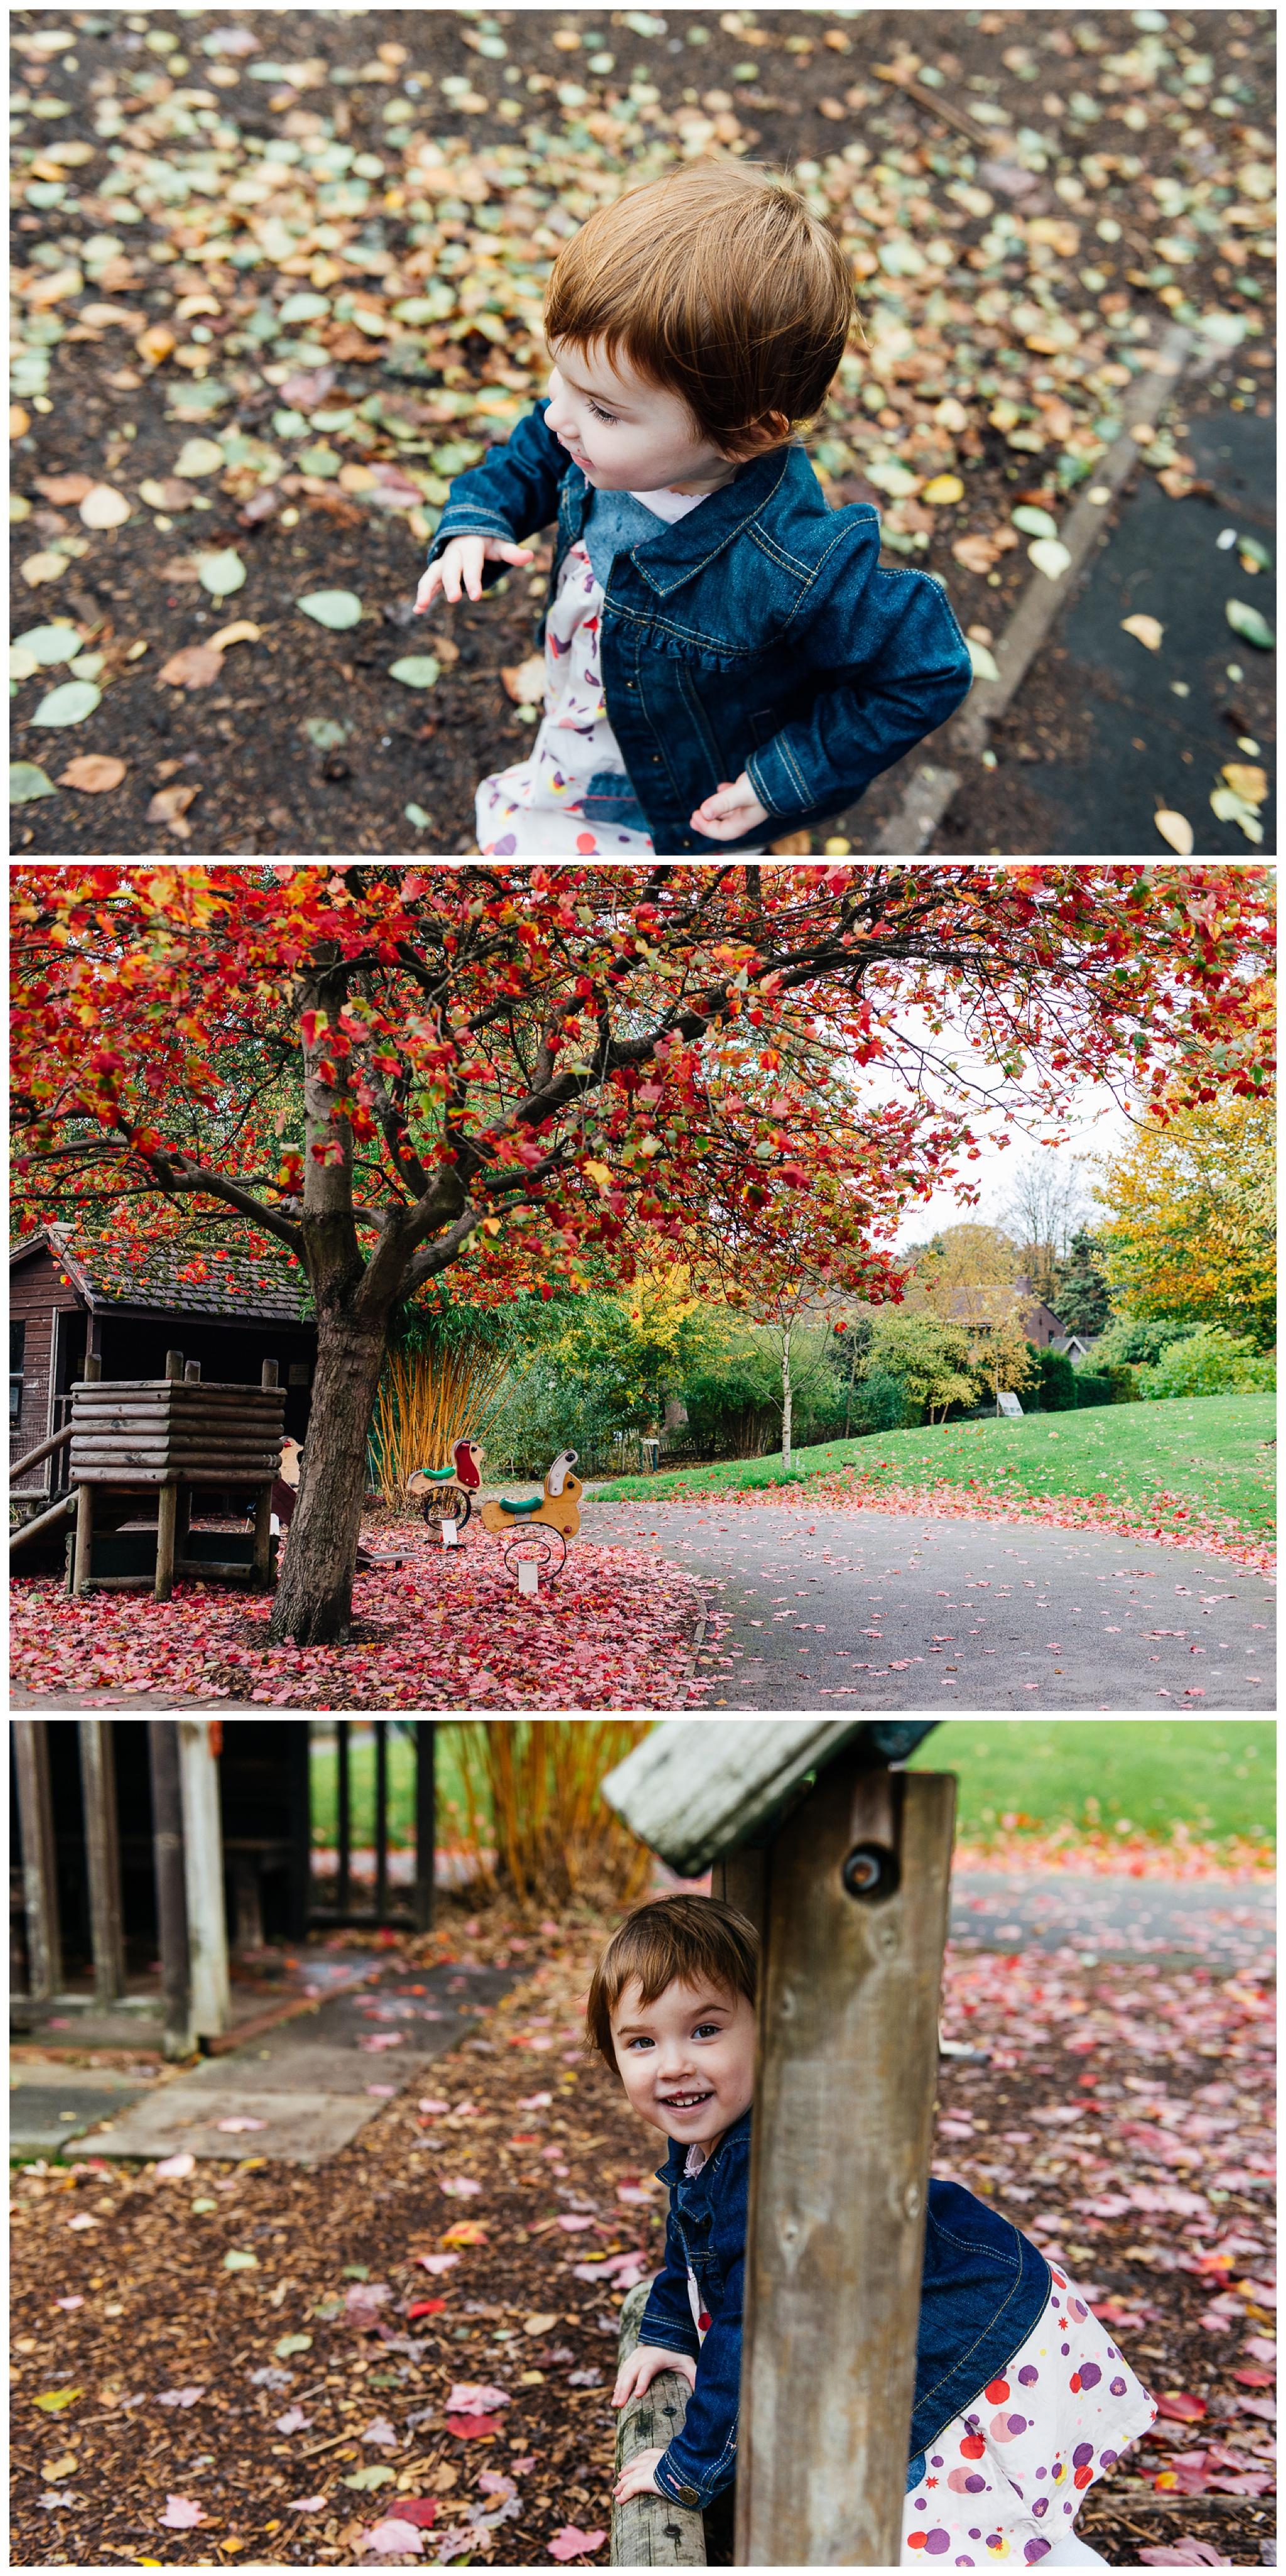 Autumn-family-portraits-birmingham-photographer_0005.jpg